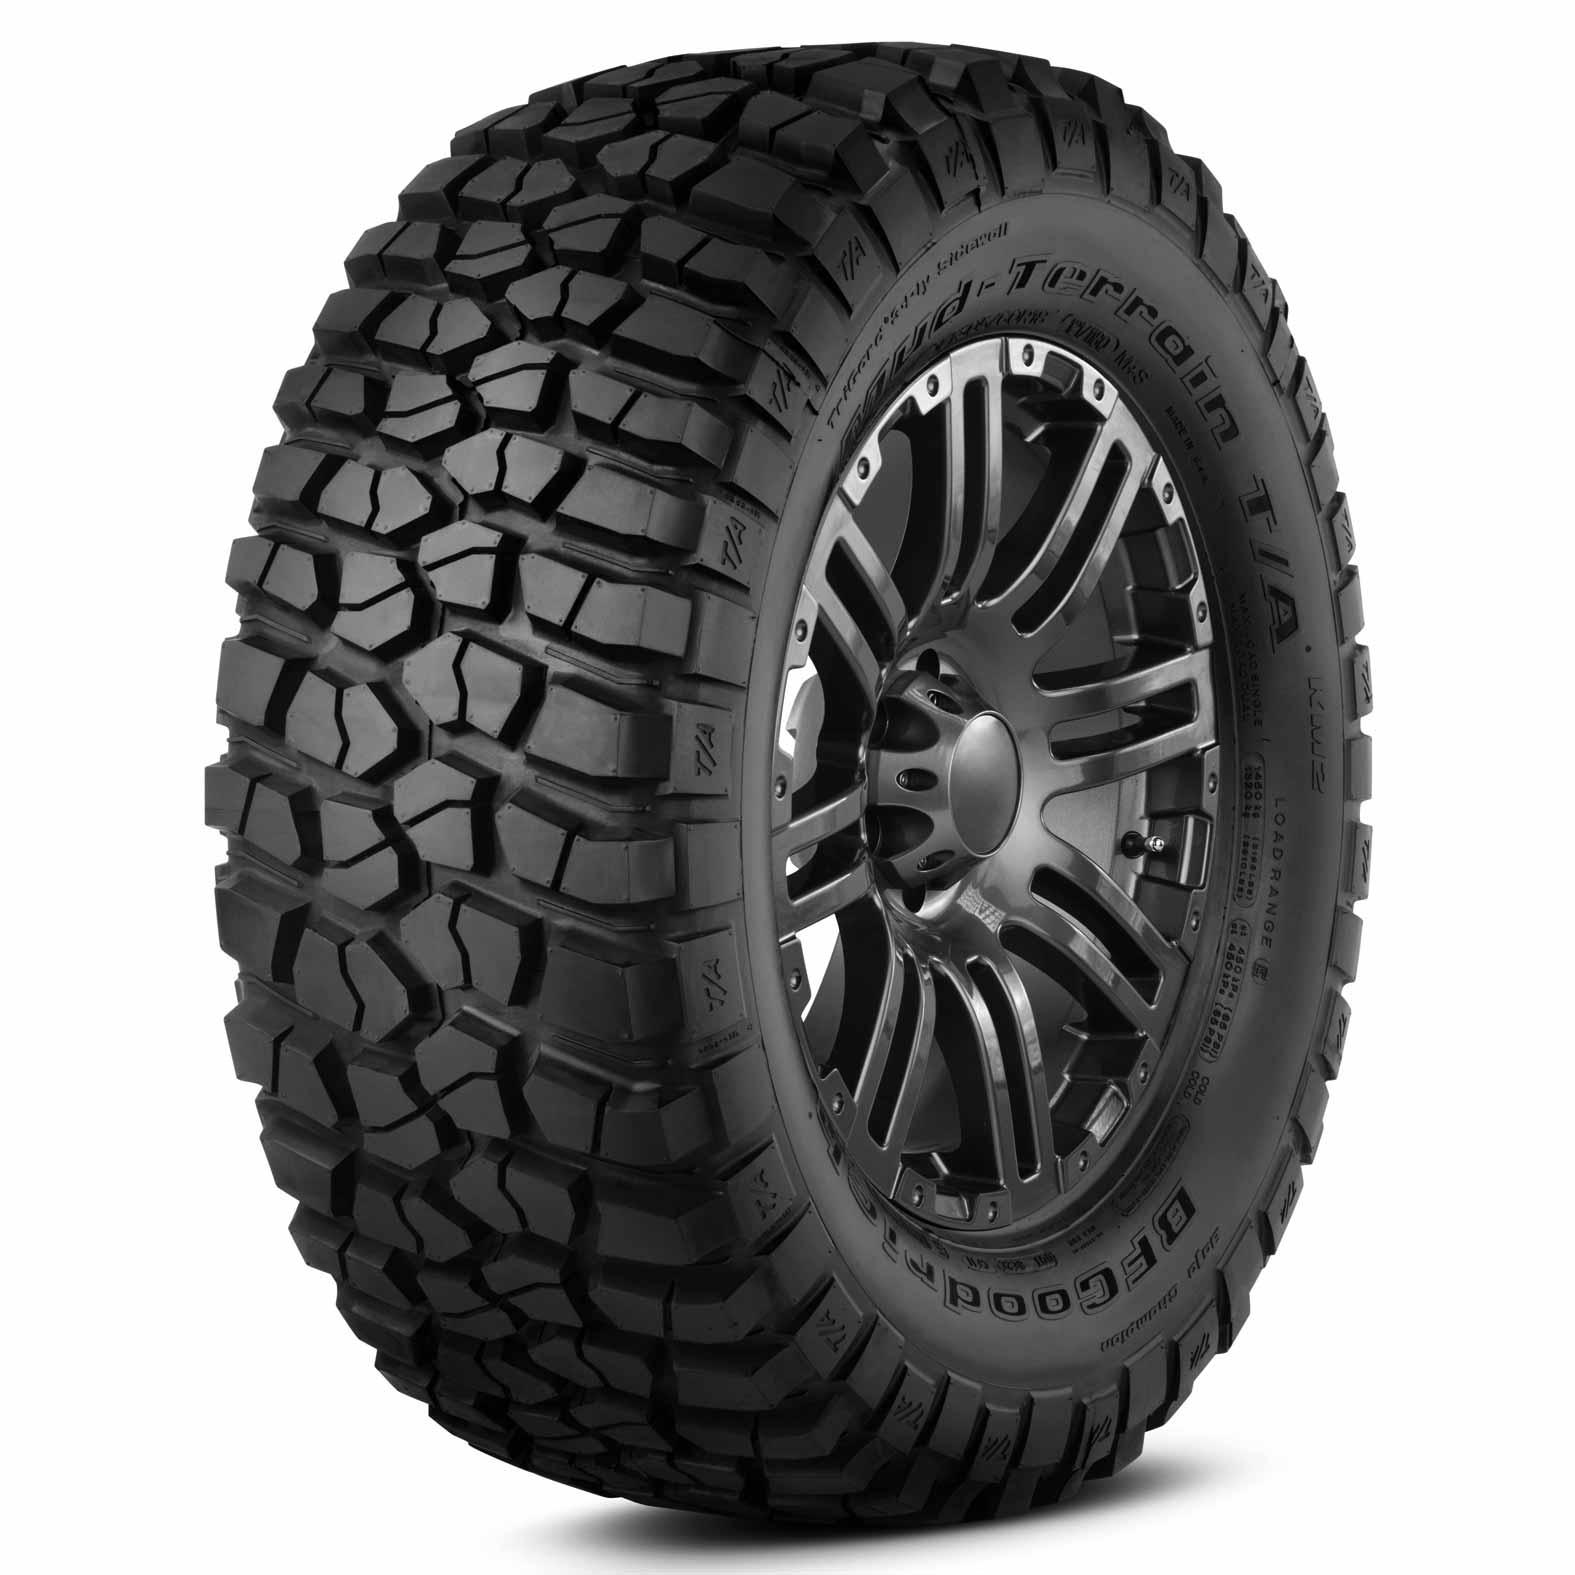 Bf Goodrich Truck Tires >> Light Truck Suv Bfgoodrich